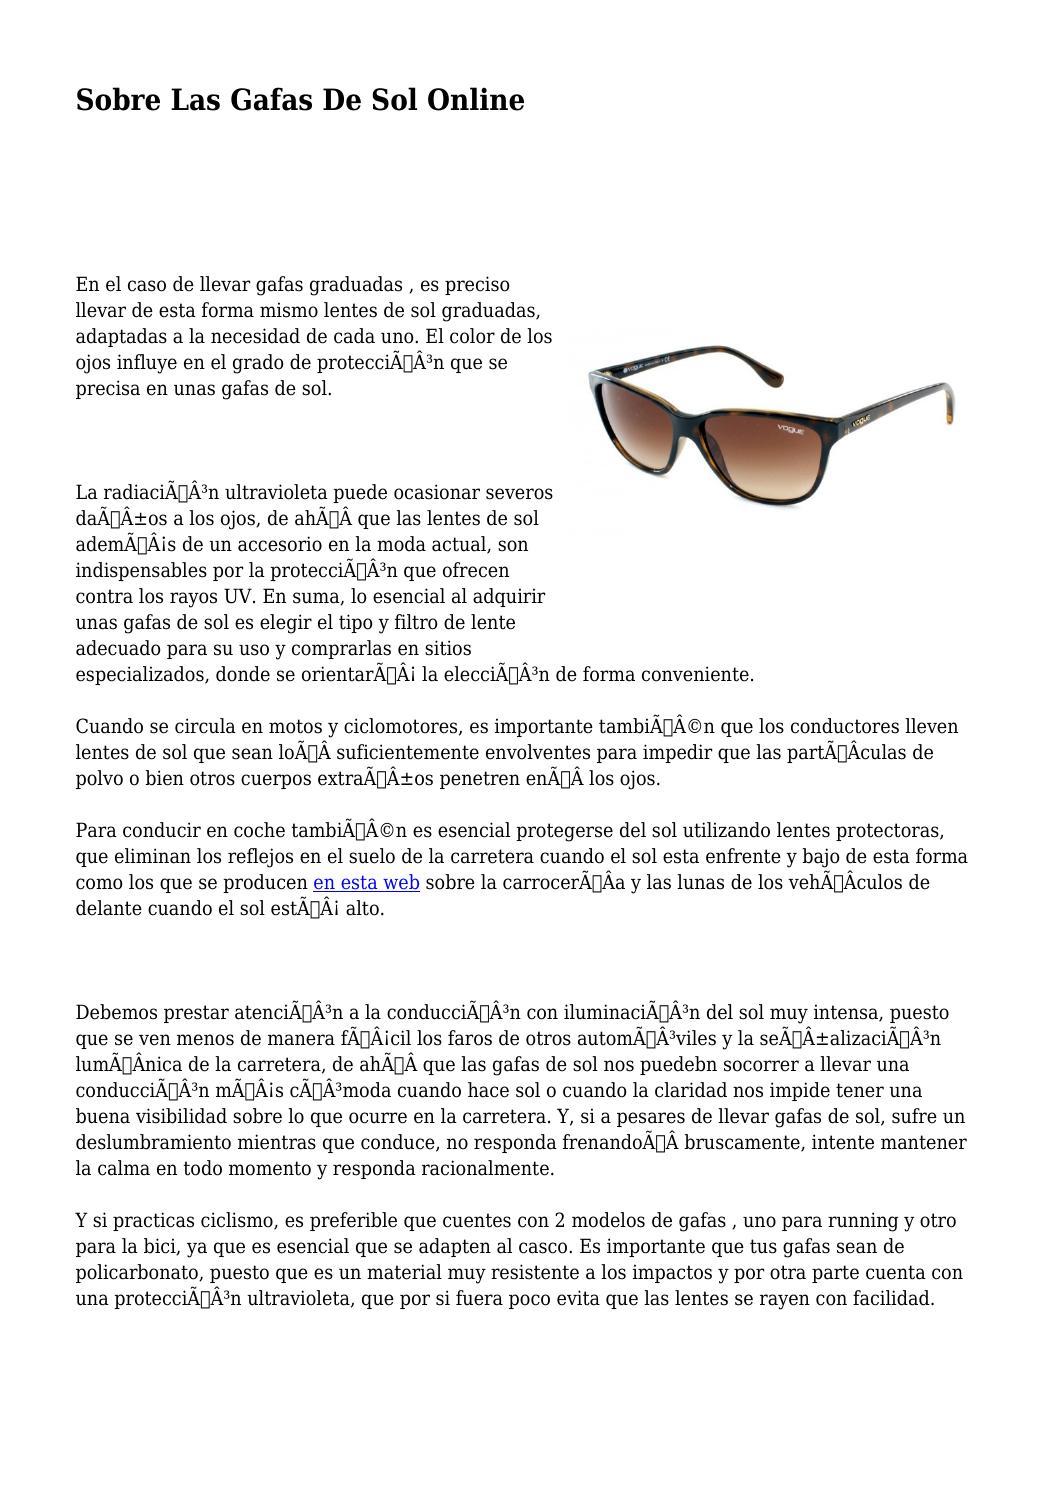 Gafas De Las By Sol Online Sobre Illgalsocial03 Issuu W29HEDIY